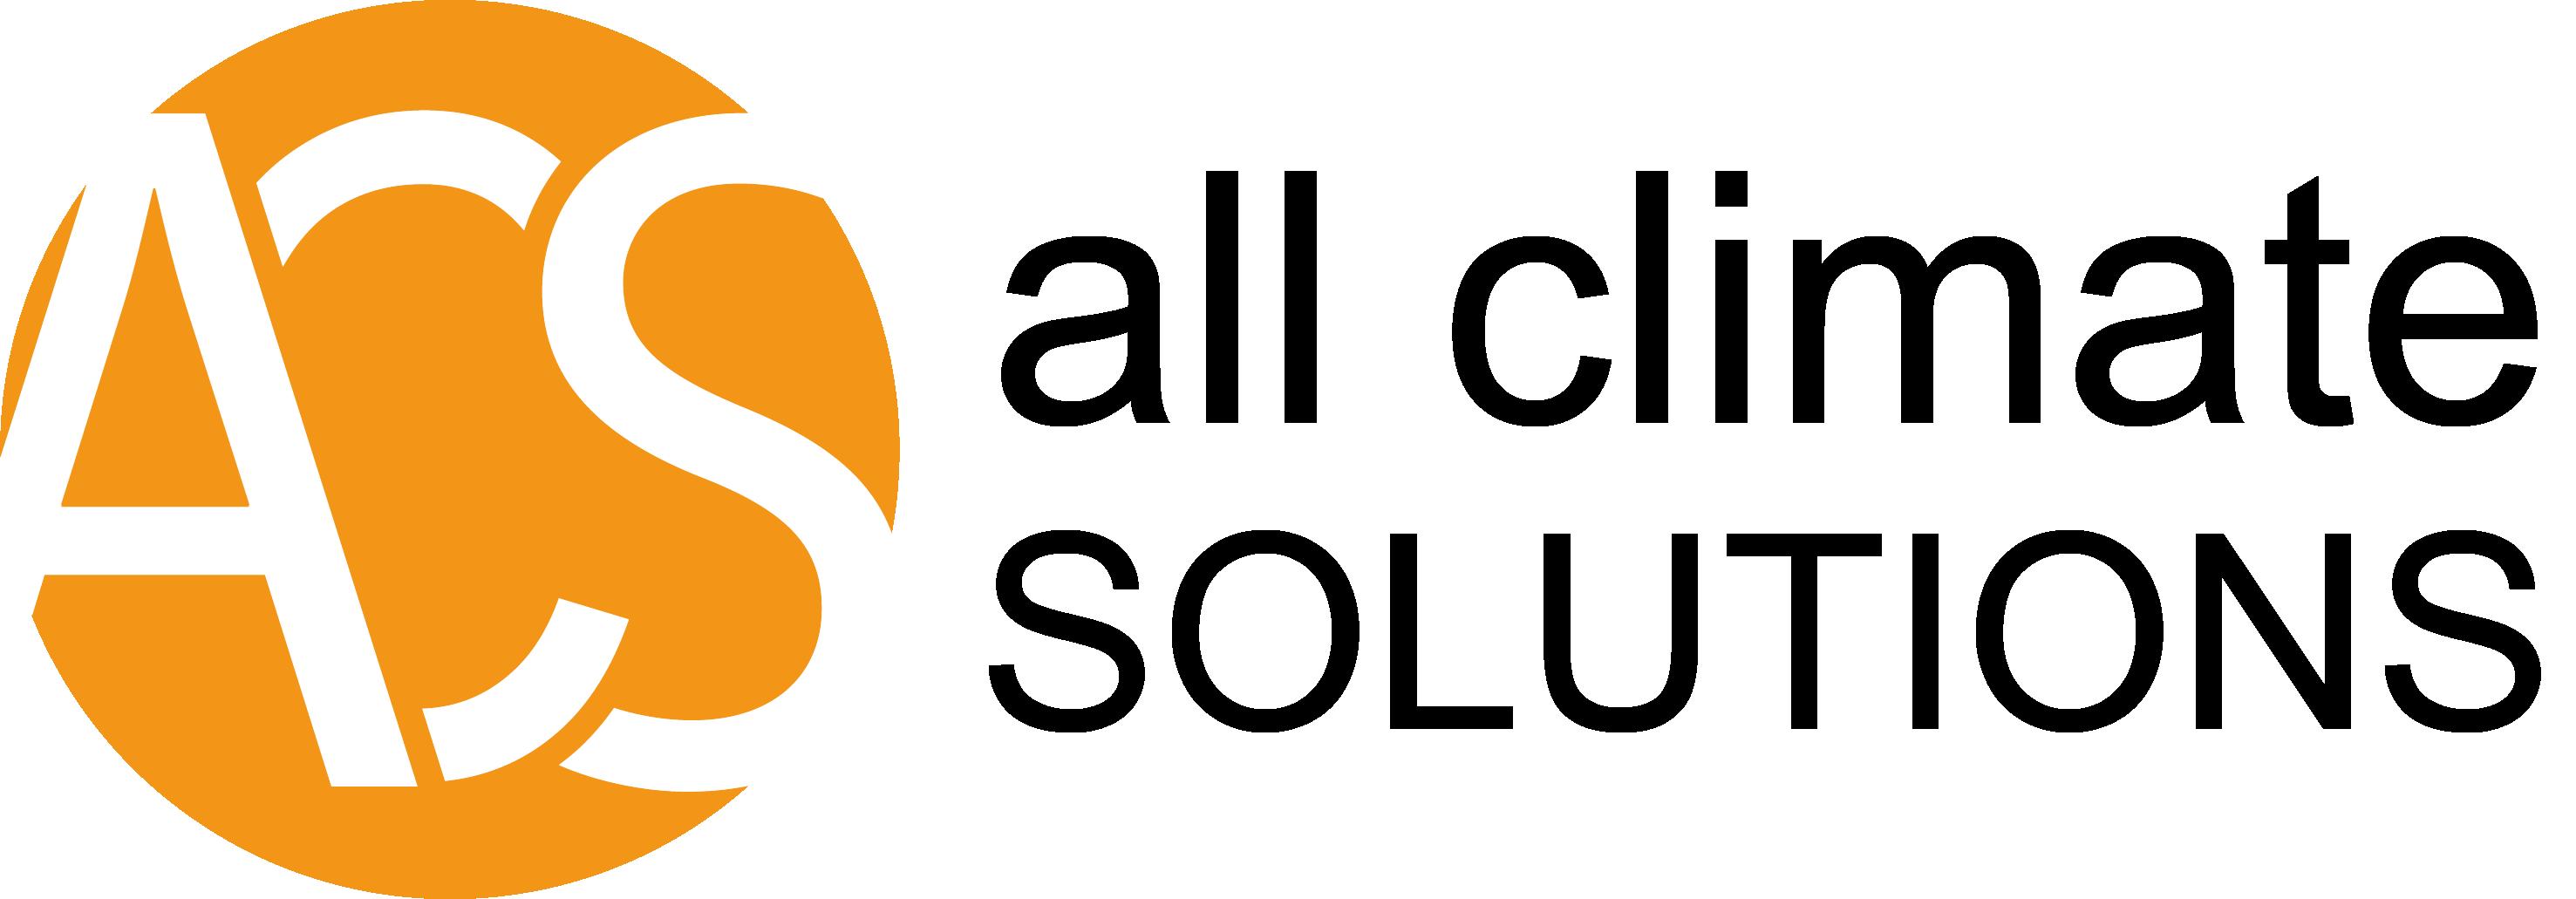 ACS logo whitetext